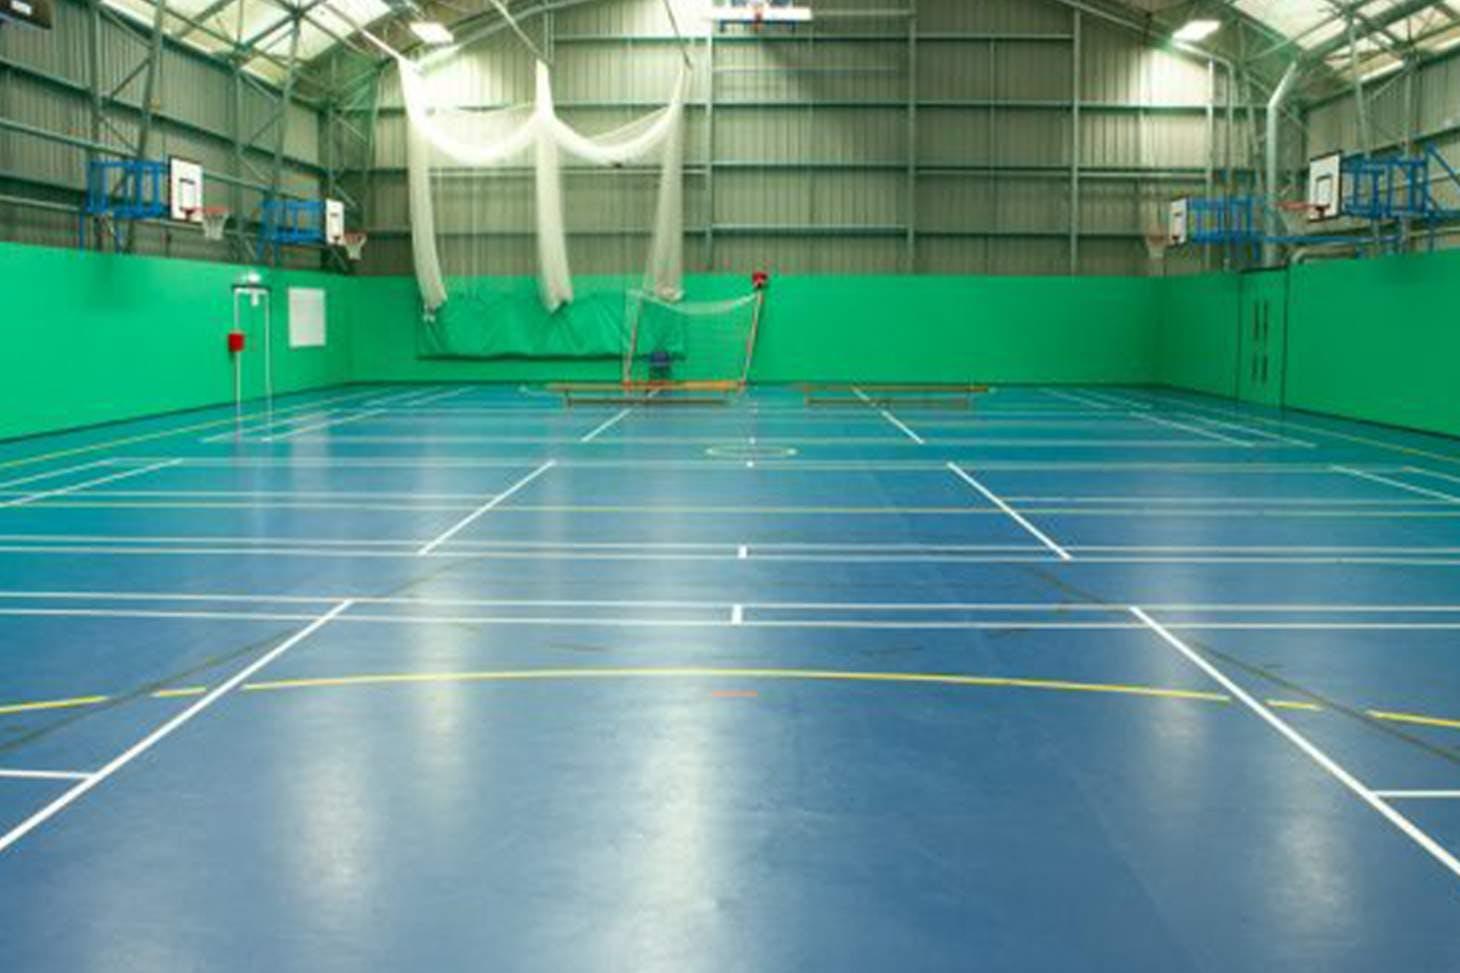 Laureate Academy Court | Sports hall basketball court